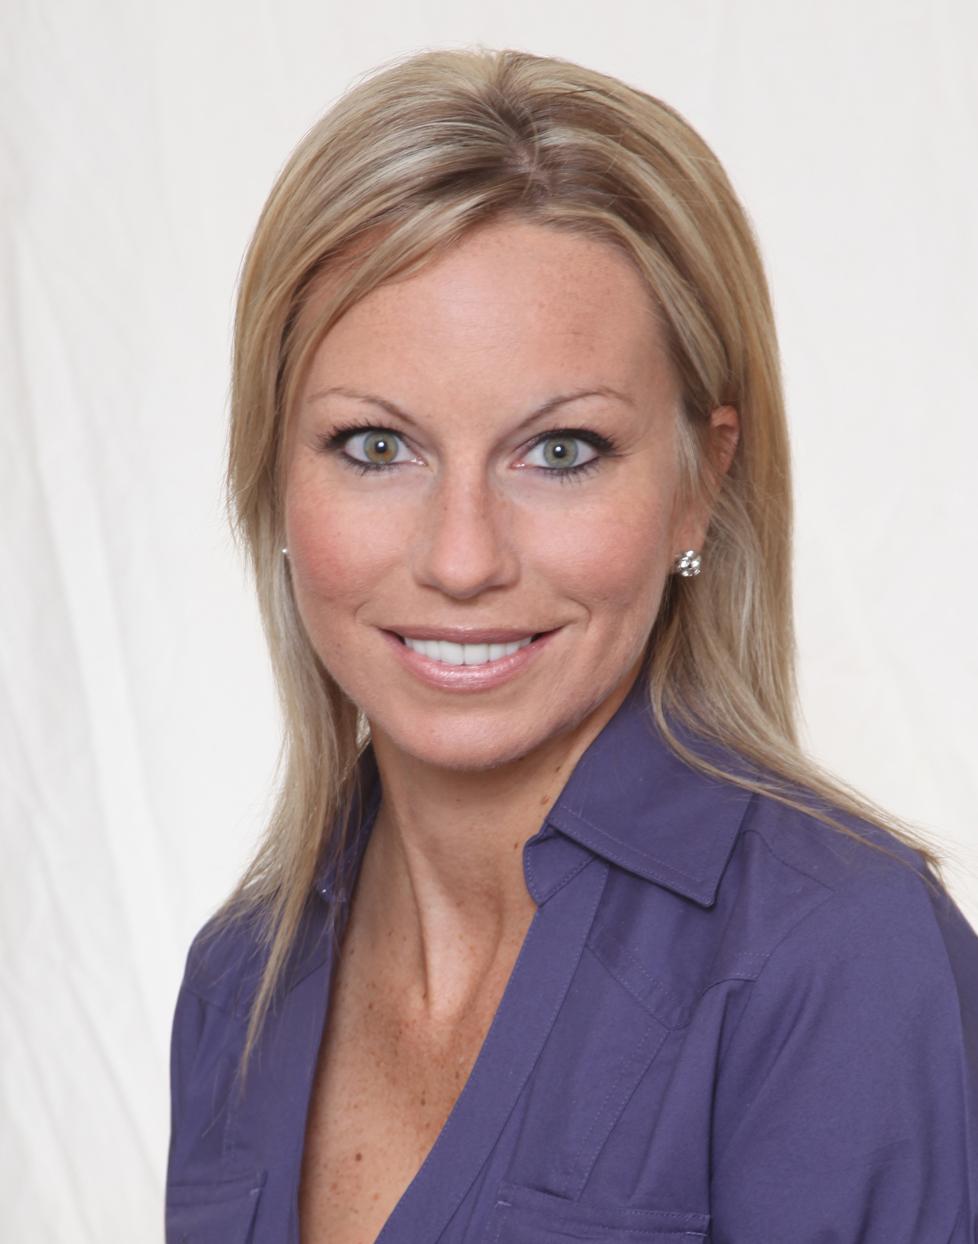 Kim Costantini